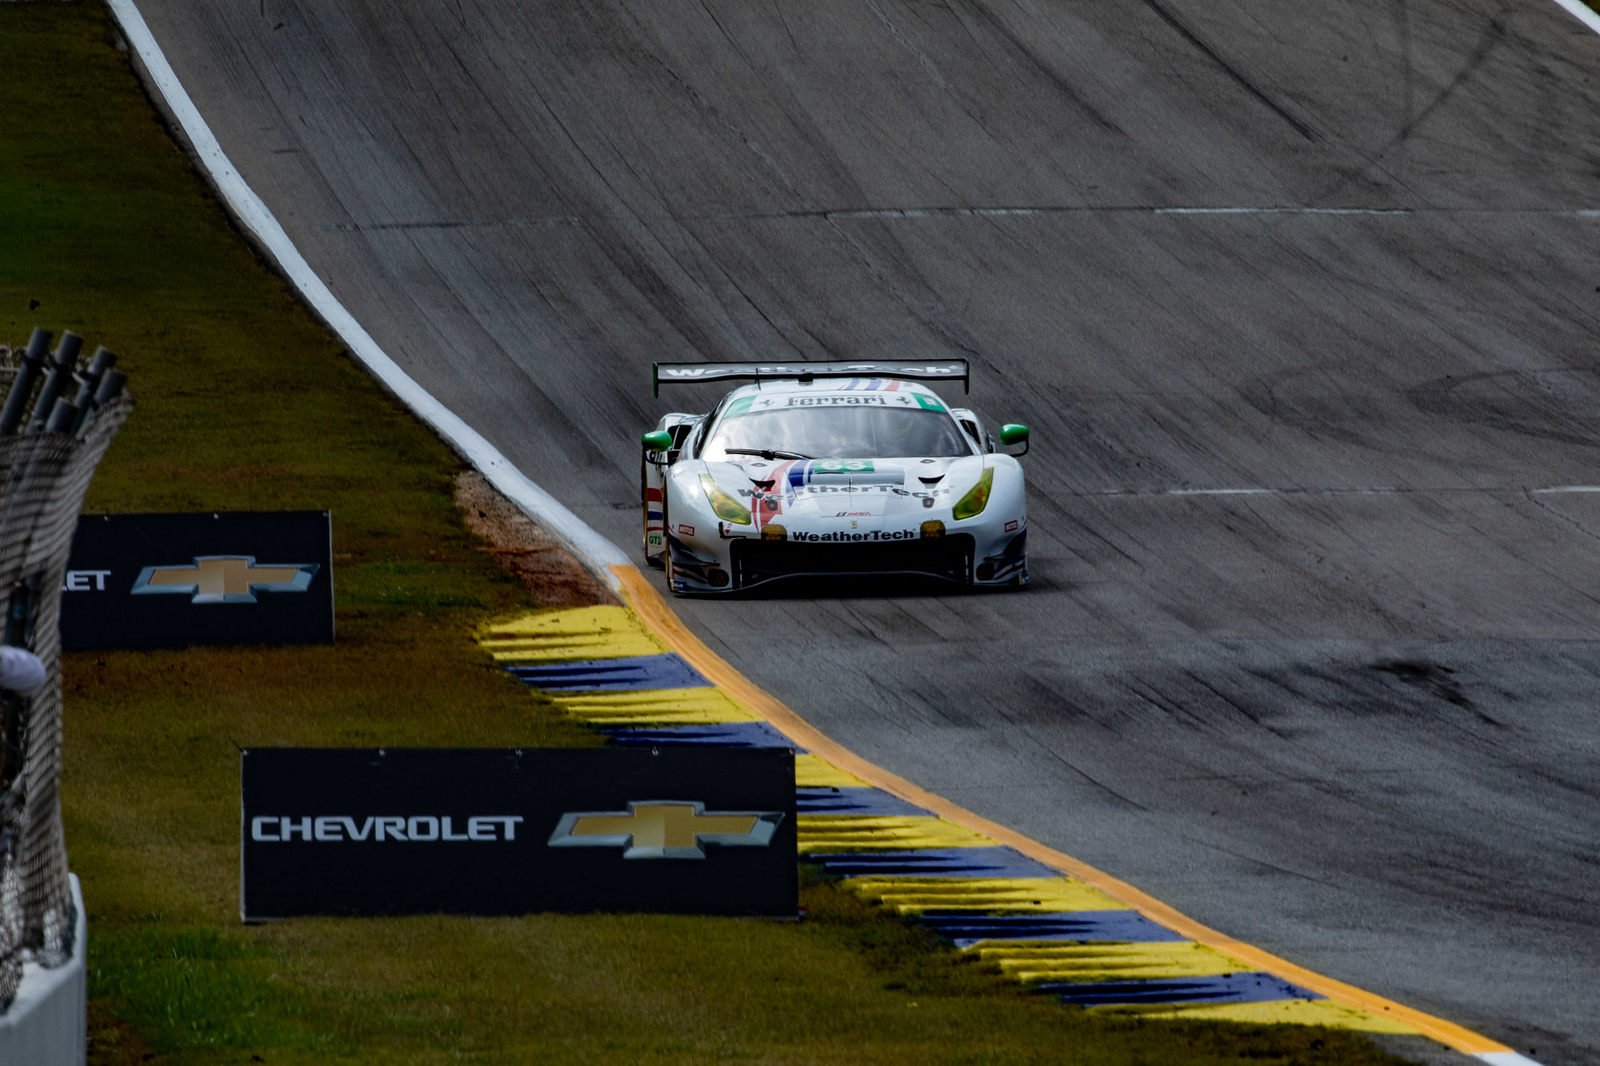 Ferrari coming down the line.